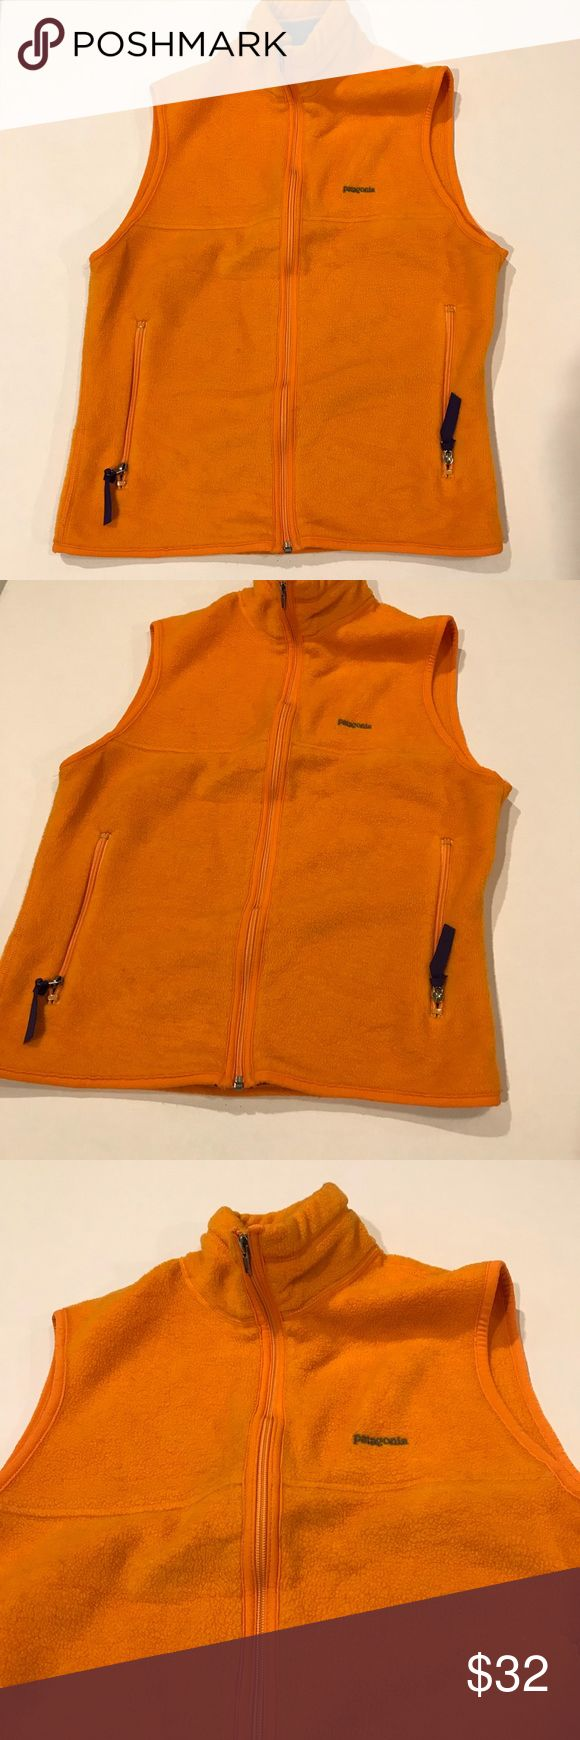 "Patagonia orange zip up vest sz small Pit to pit:19"" Length:23.5"" Waist:34"" Patagonia Jackets & Coats Vests"